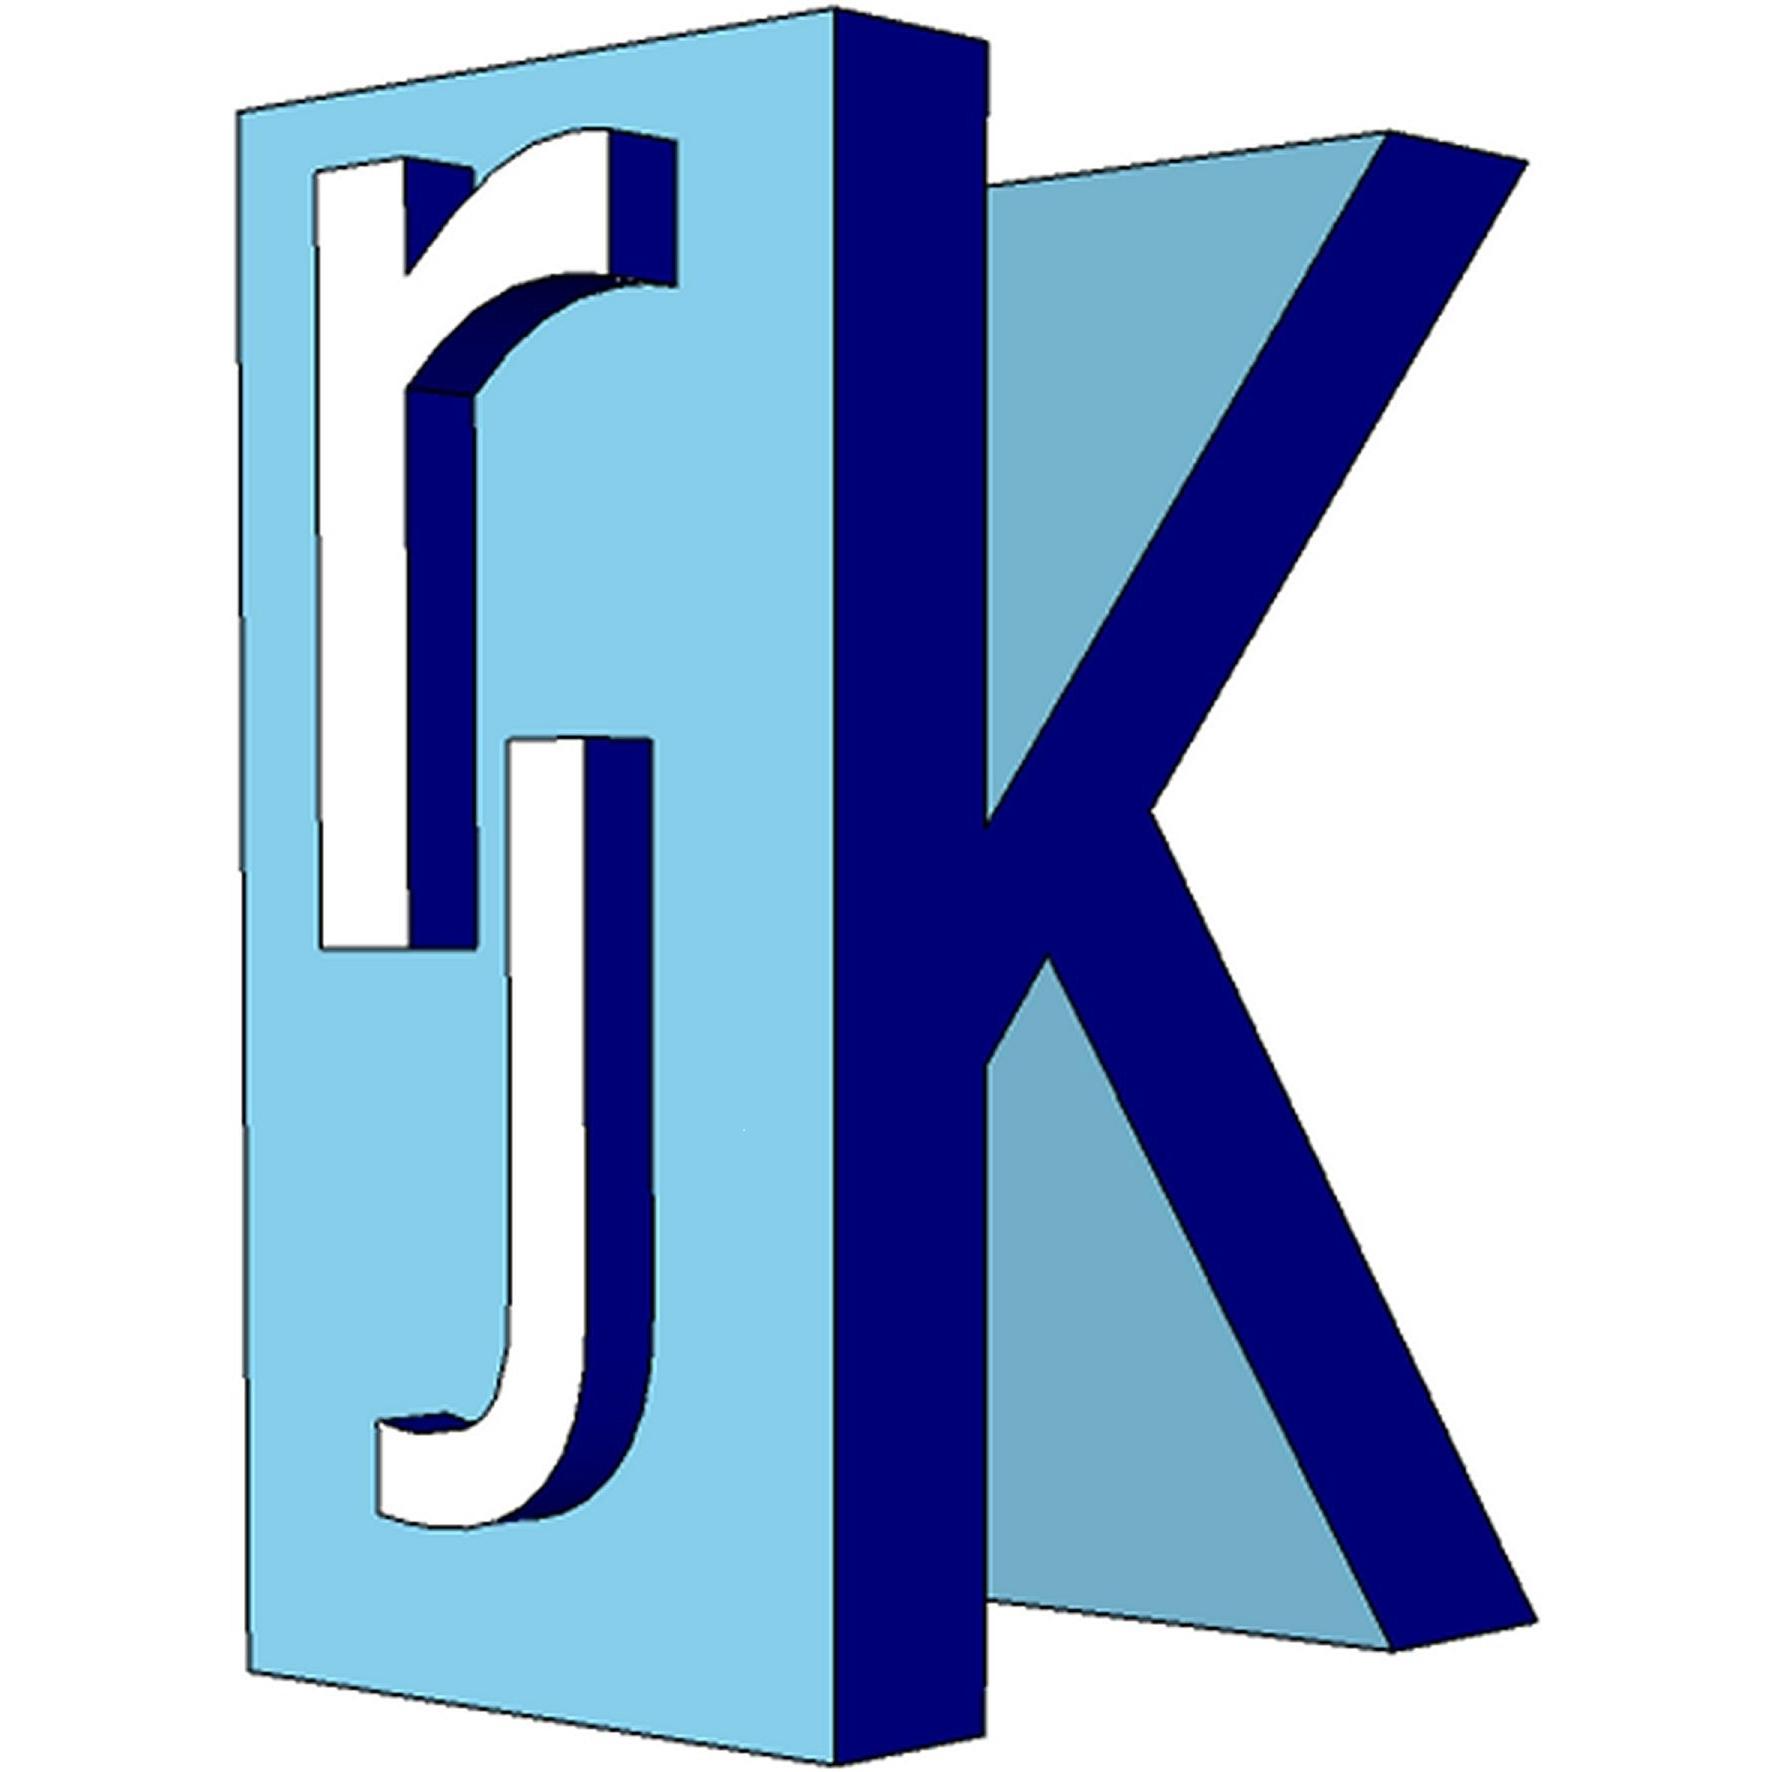 RJ Kelly and Associates